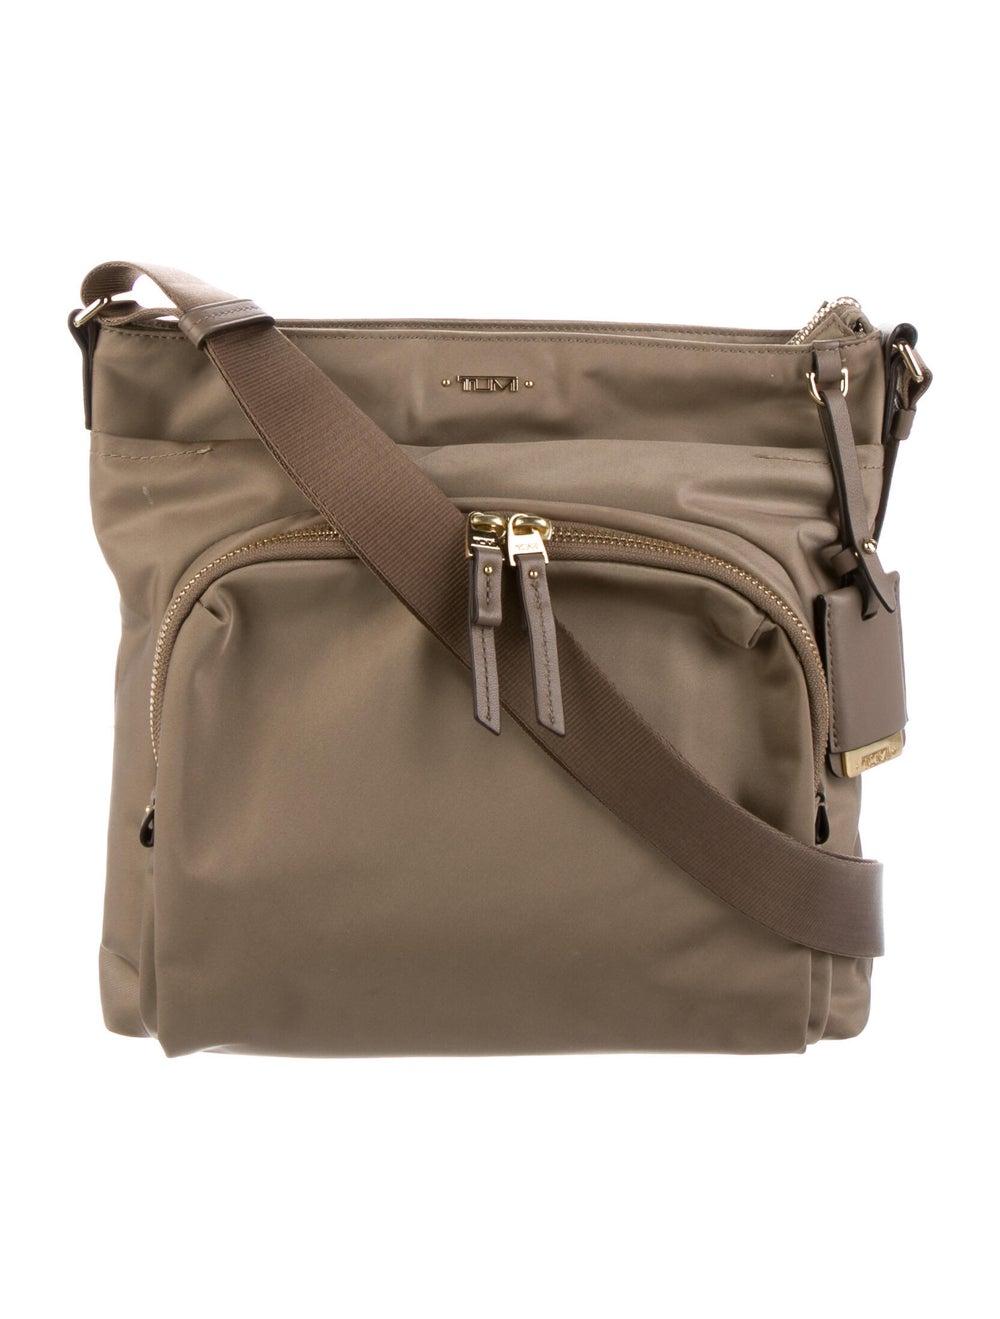 Tumi Nylon SHoulder Bag Gold - image 1